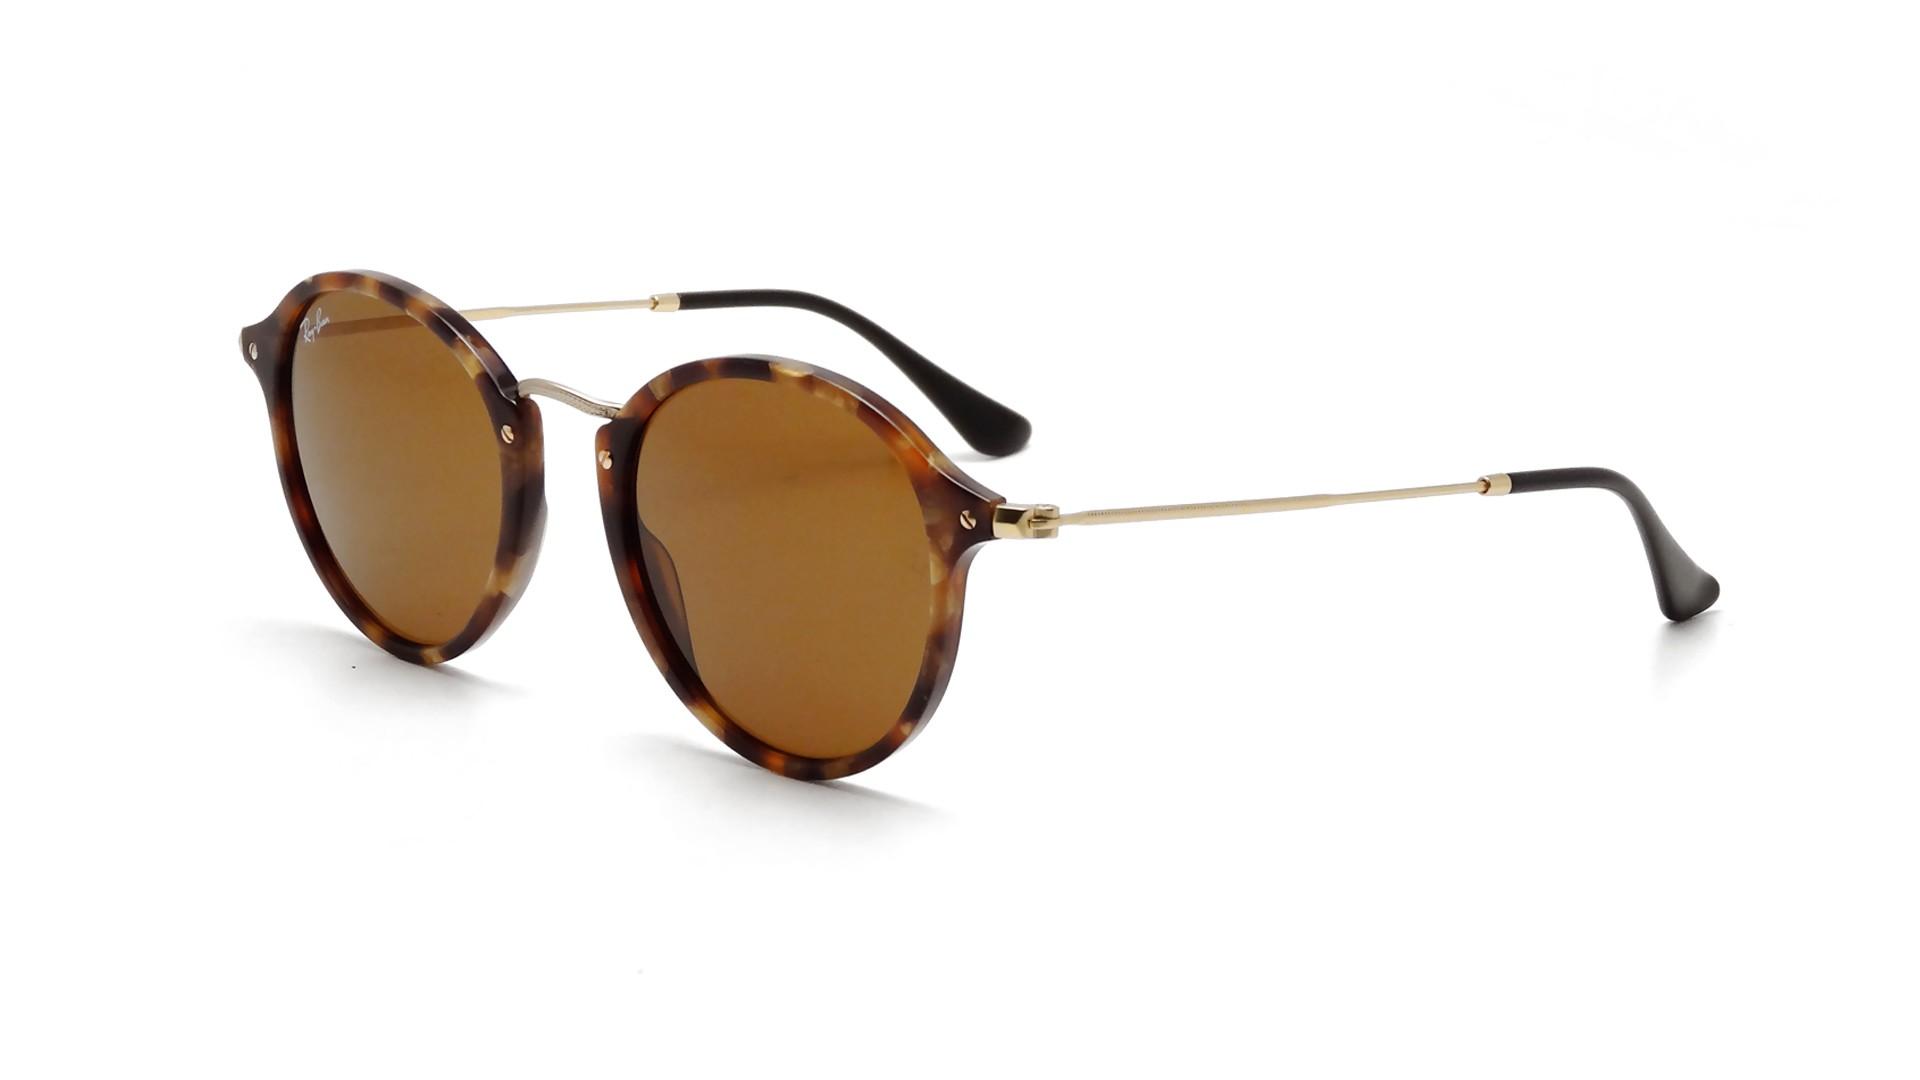 416adfc3f81 Sunglasses Ray-Ban Round Fleck Tortoise B15 RB2447 1160 49-21 Medium